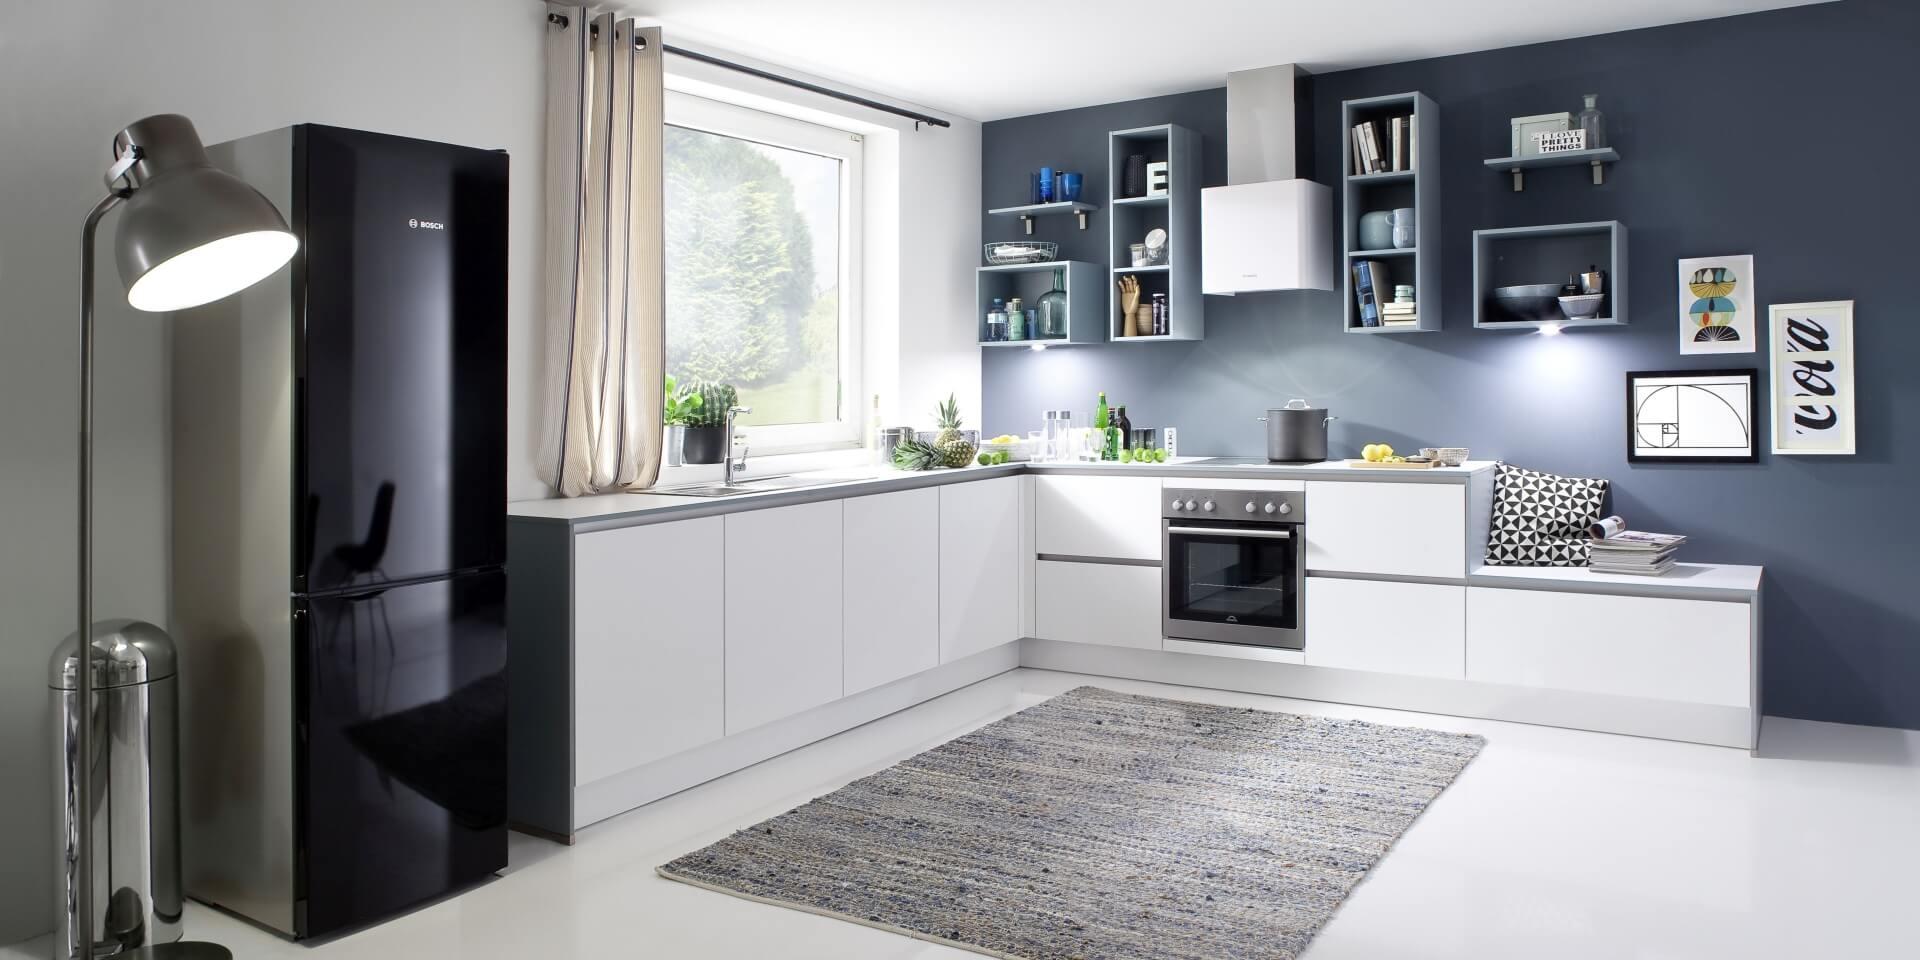 Genau meine Küche KE GmbH - Home